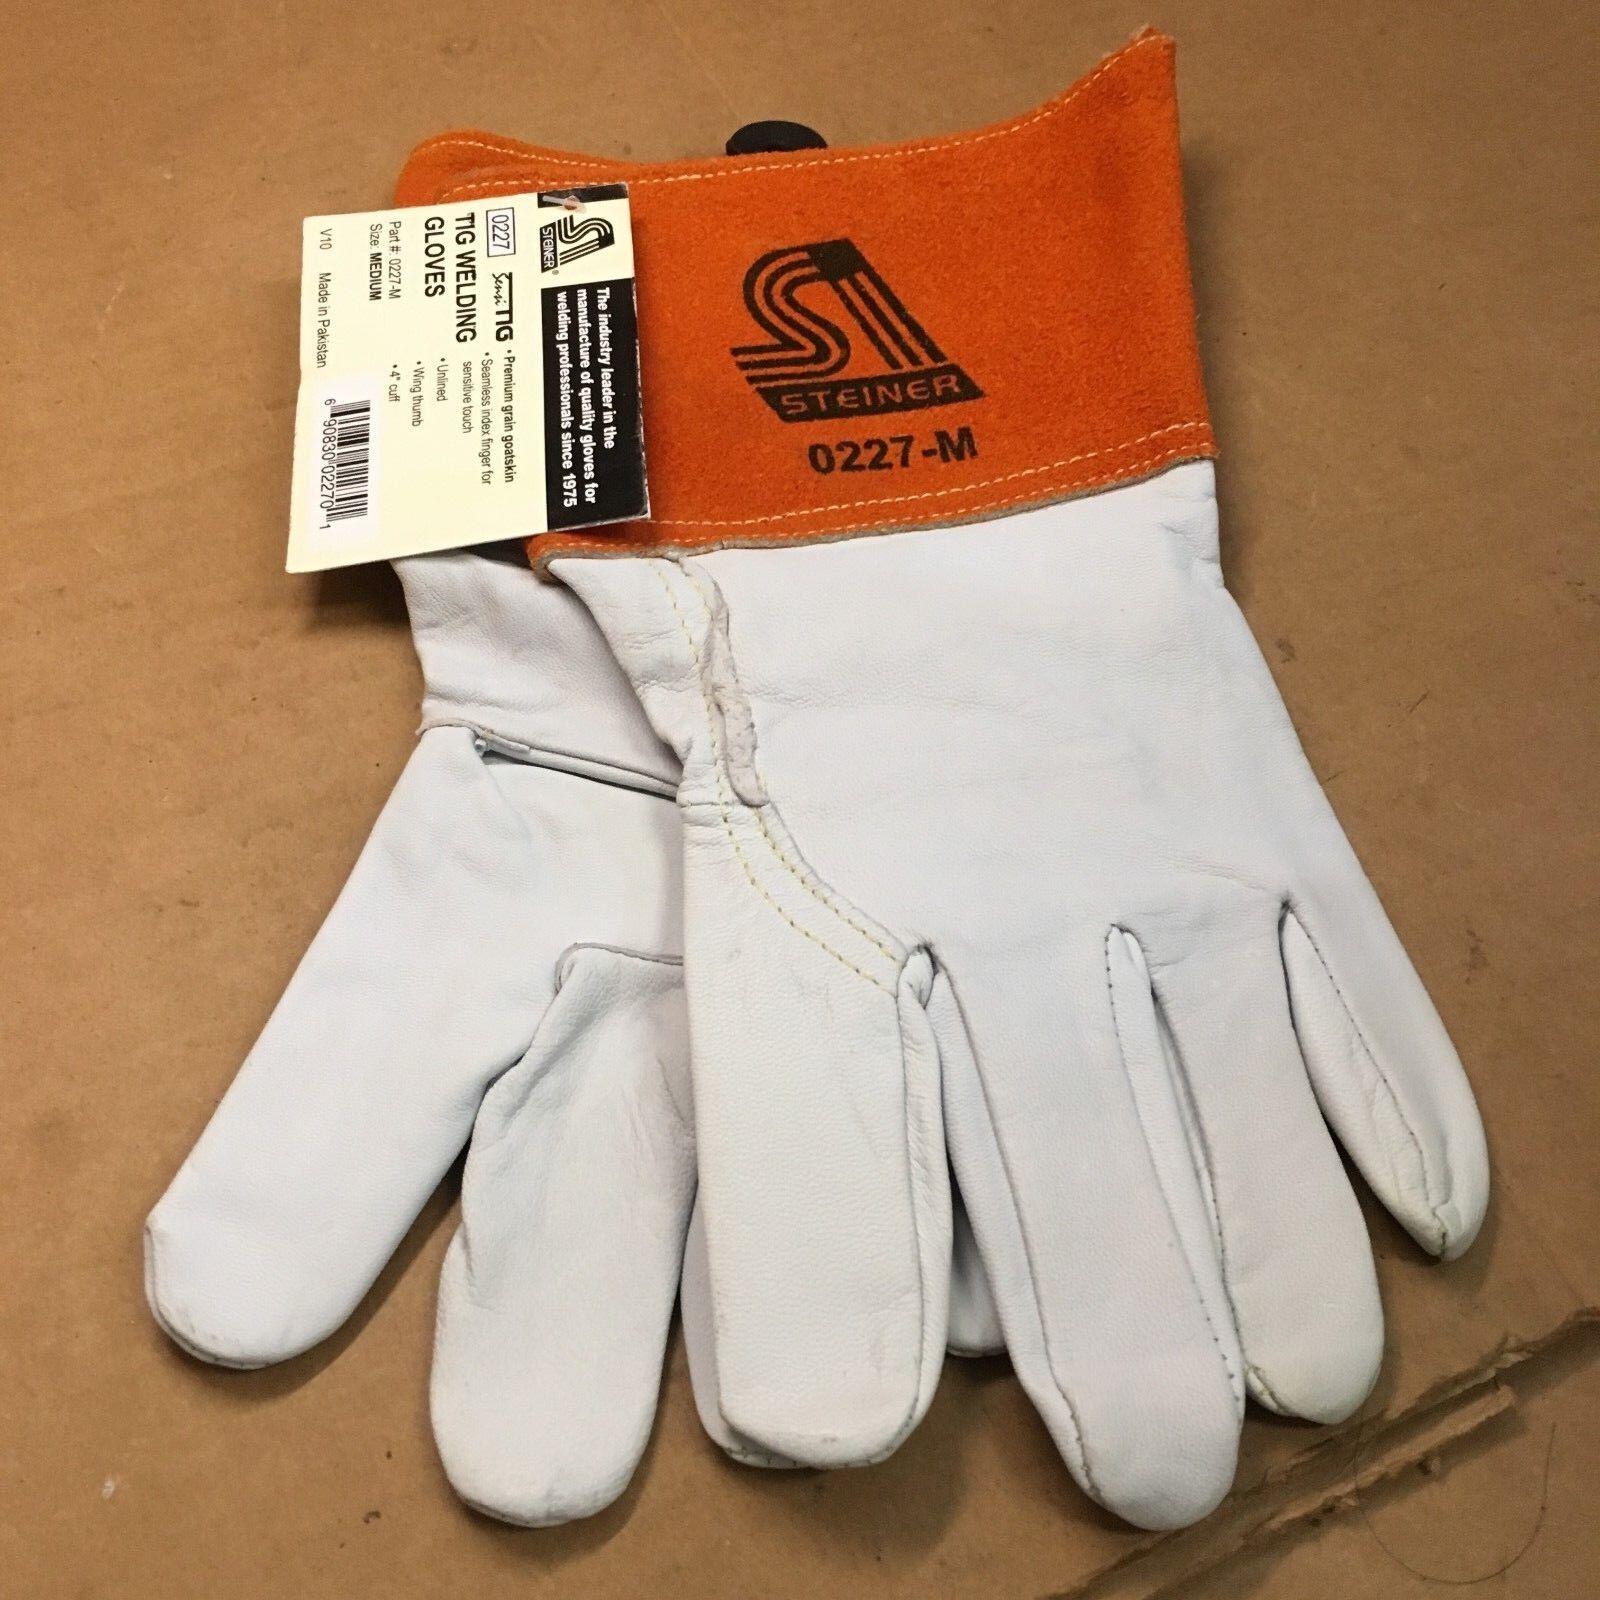 Tillman 1328 Xl Top Grain Goatskin Tig Welding Gloves Extra Large 4 Cuff Safety Welding Gloves Business Industrial Sidra Hospital